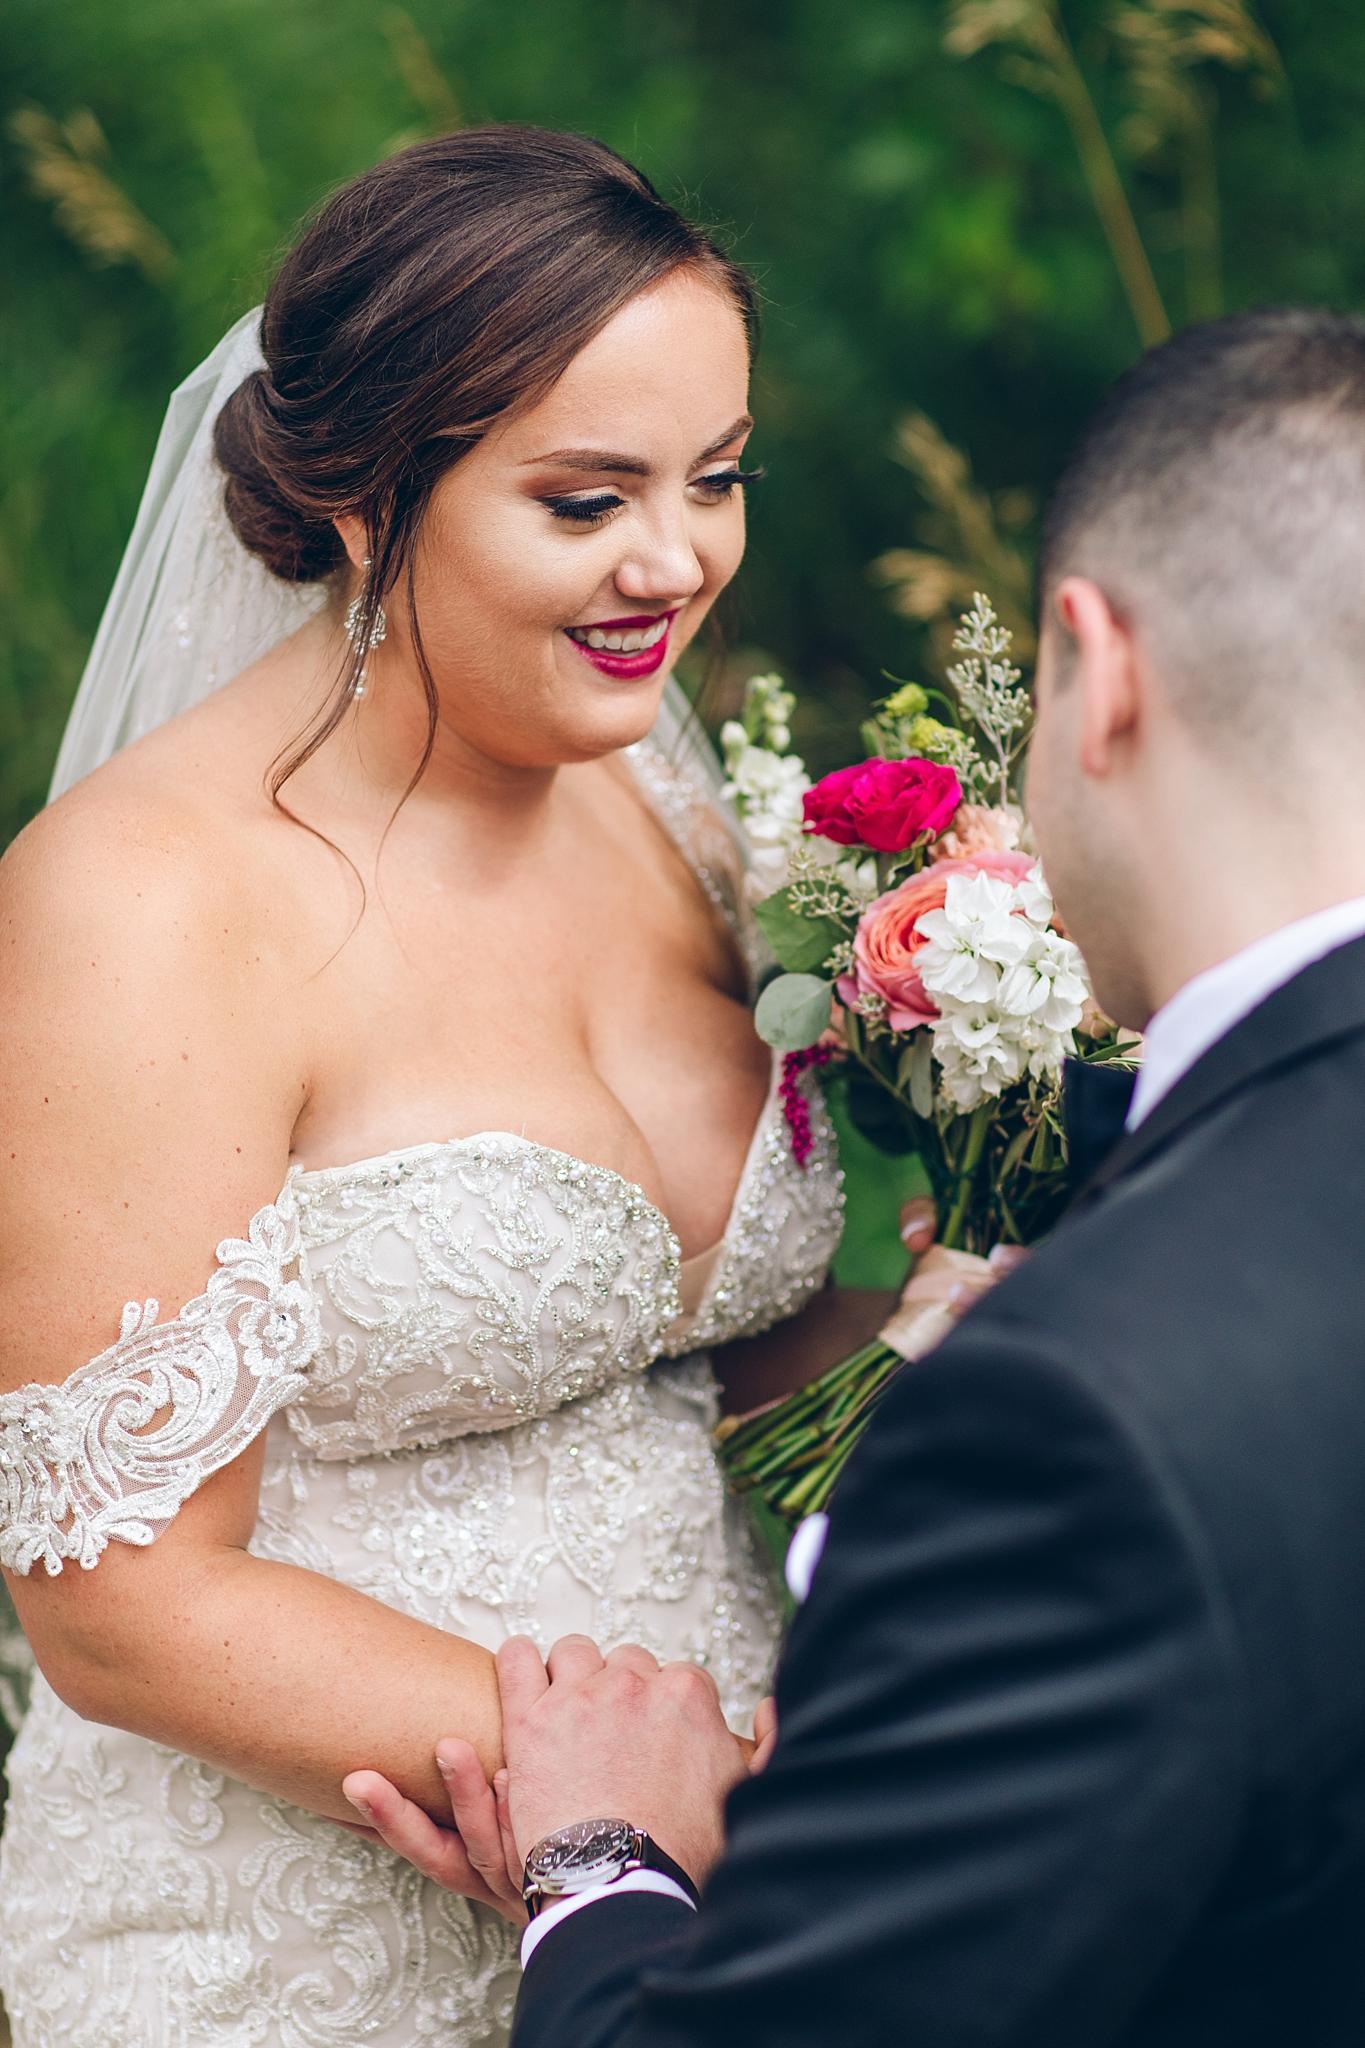 baker-lofts-holland-michigan-wedding-photographer_0345.jpg